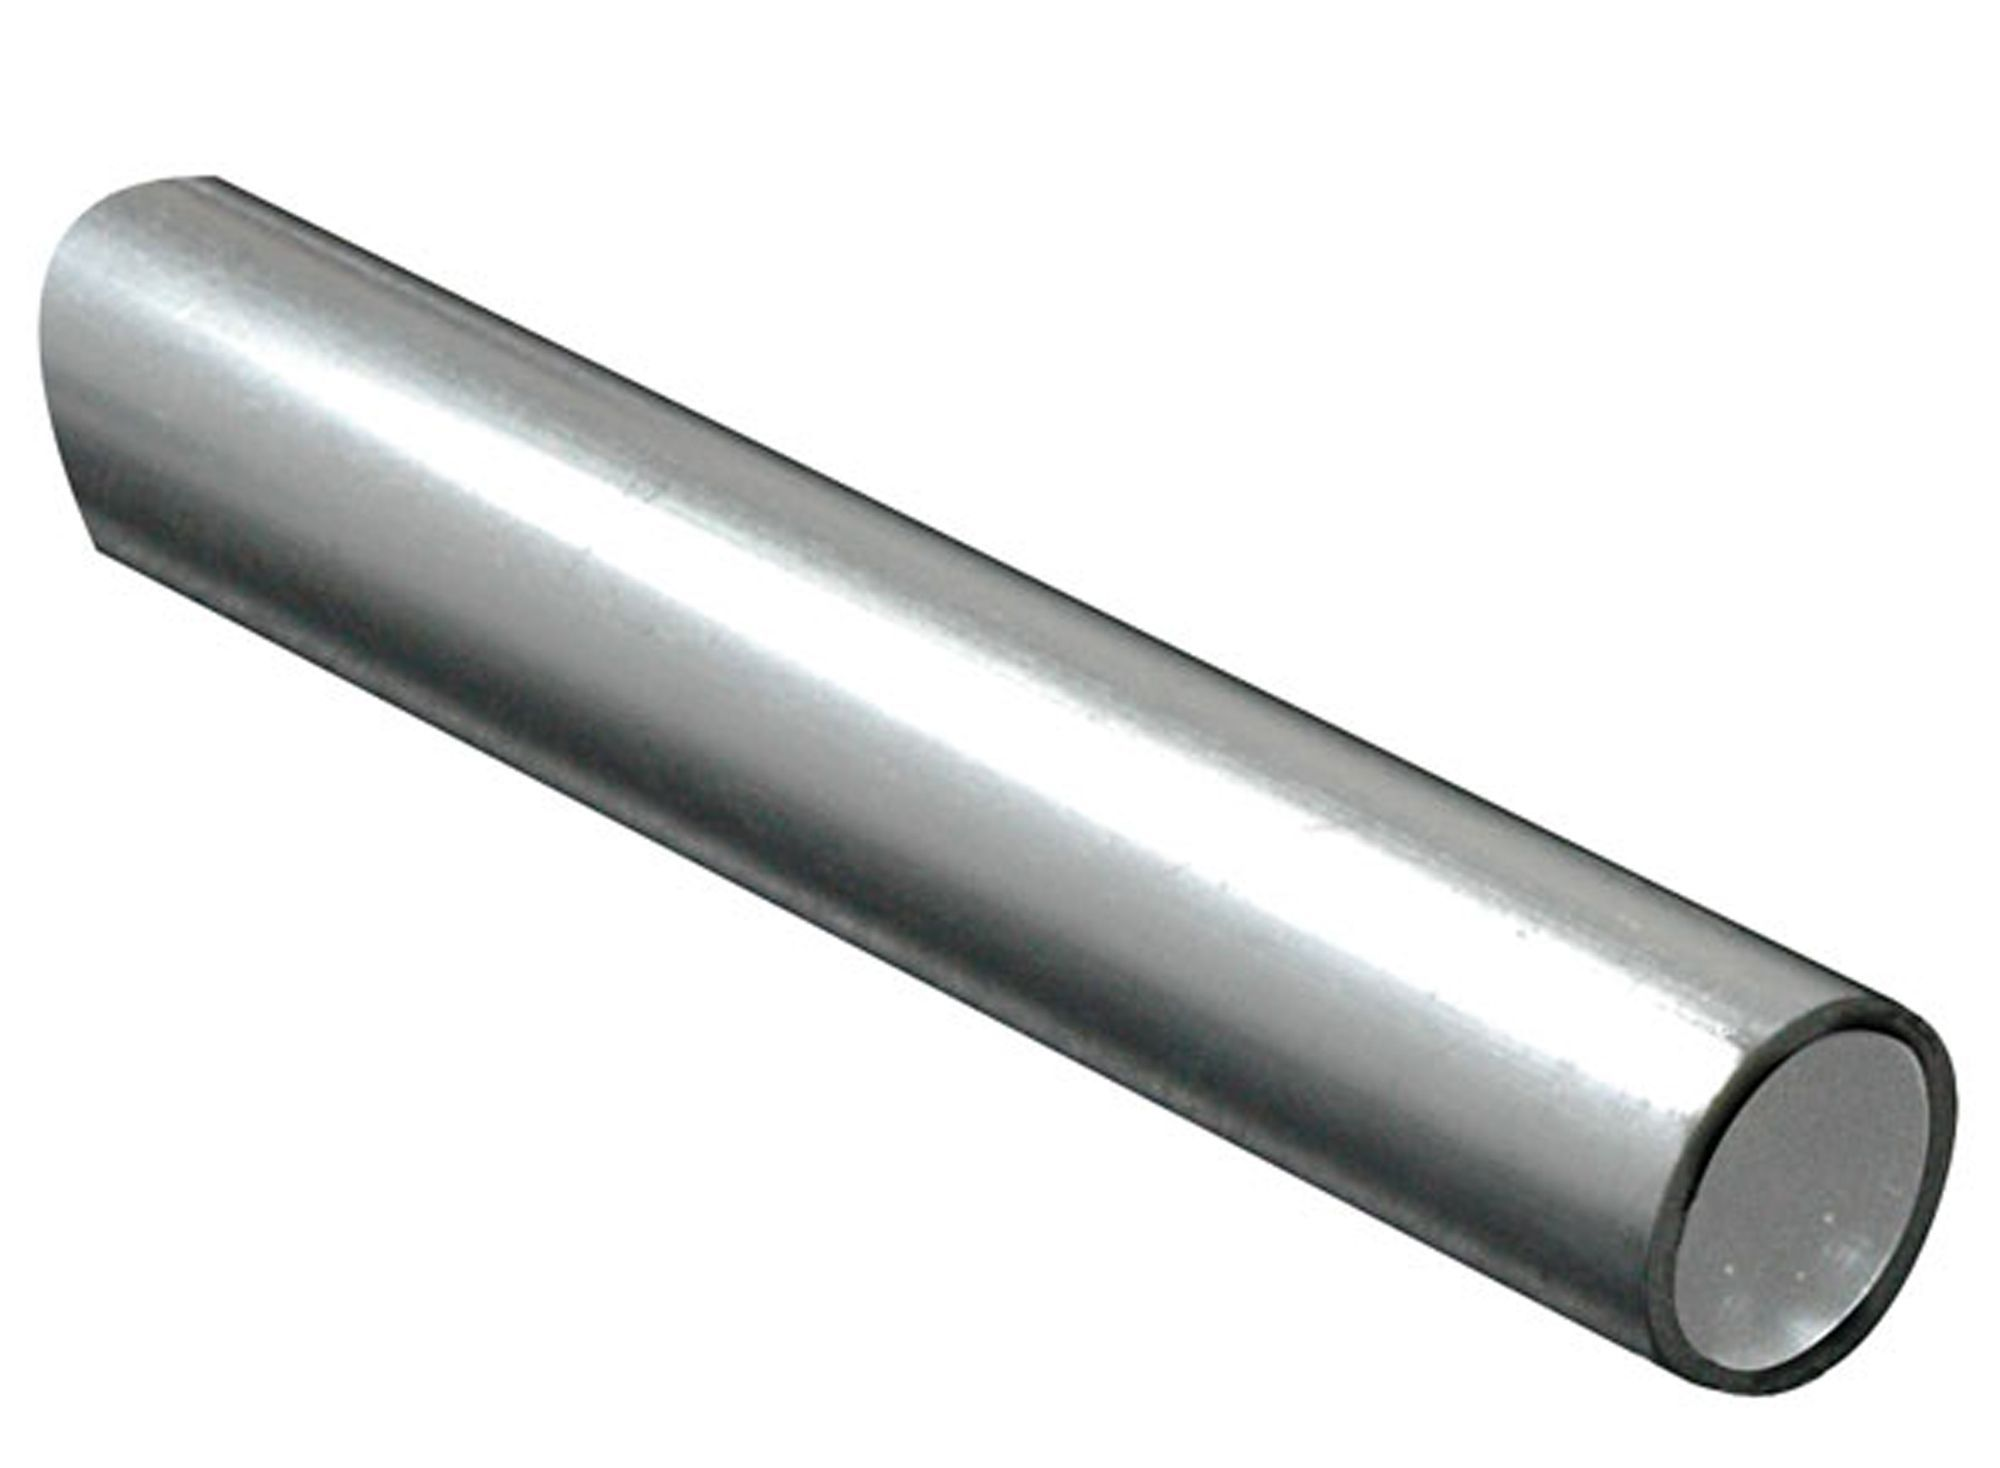 ffa concept aluminium round tube w 12mm l 1m. Black Bedroom Furniture Sets. Home Design Ideas